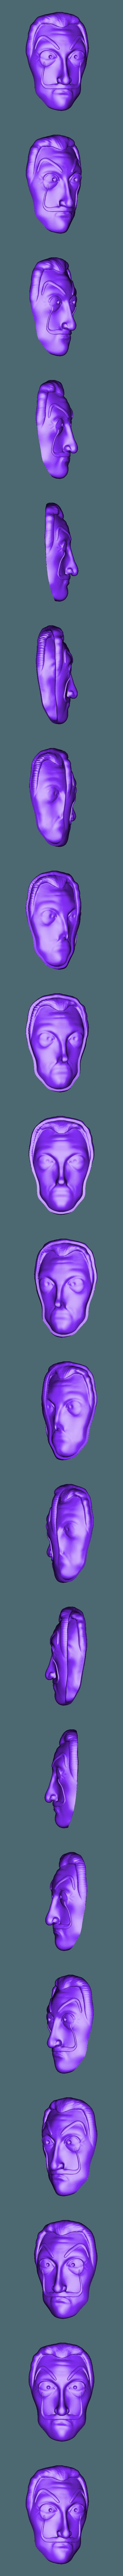 Dali paper house mask